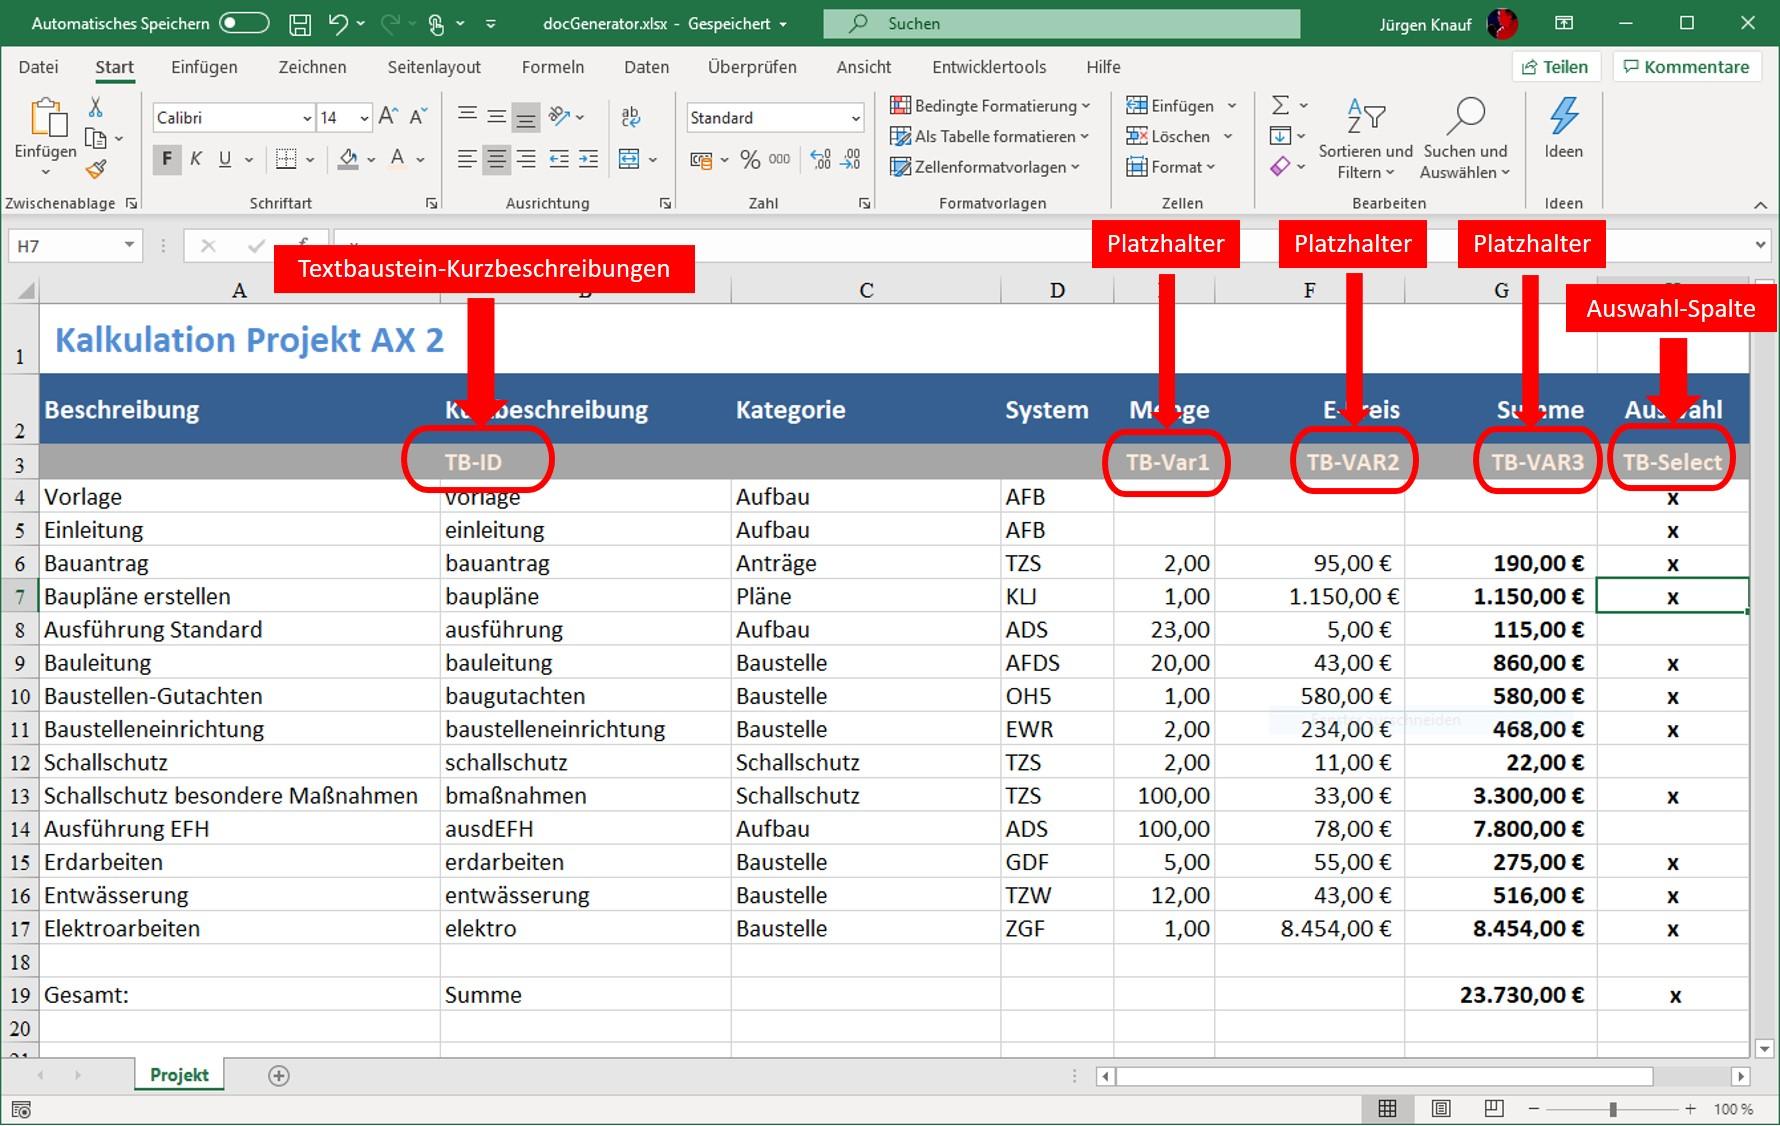 Excel Schnittstelle / Creator   Dokumente automatisieren